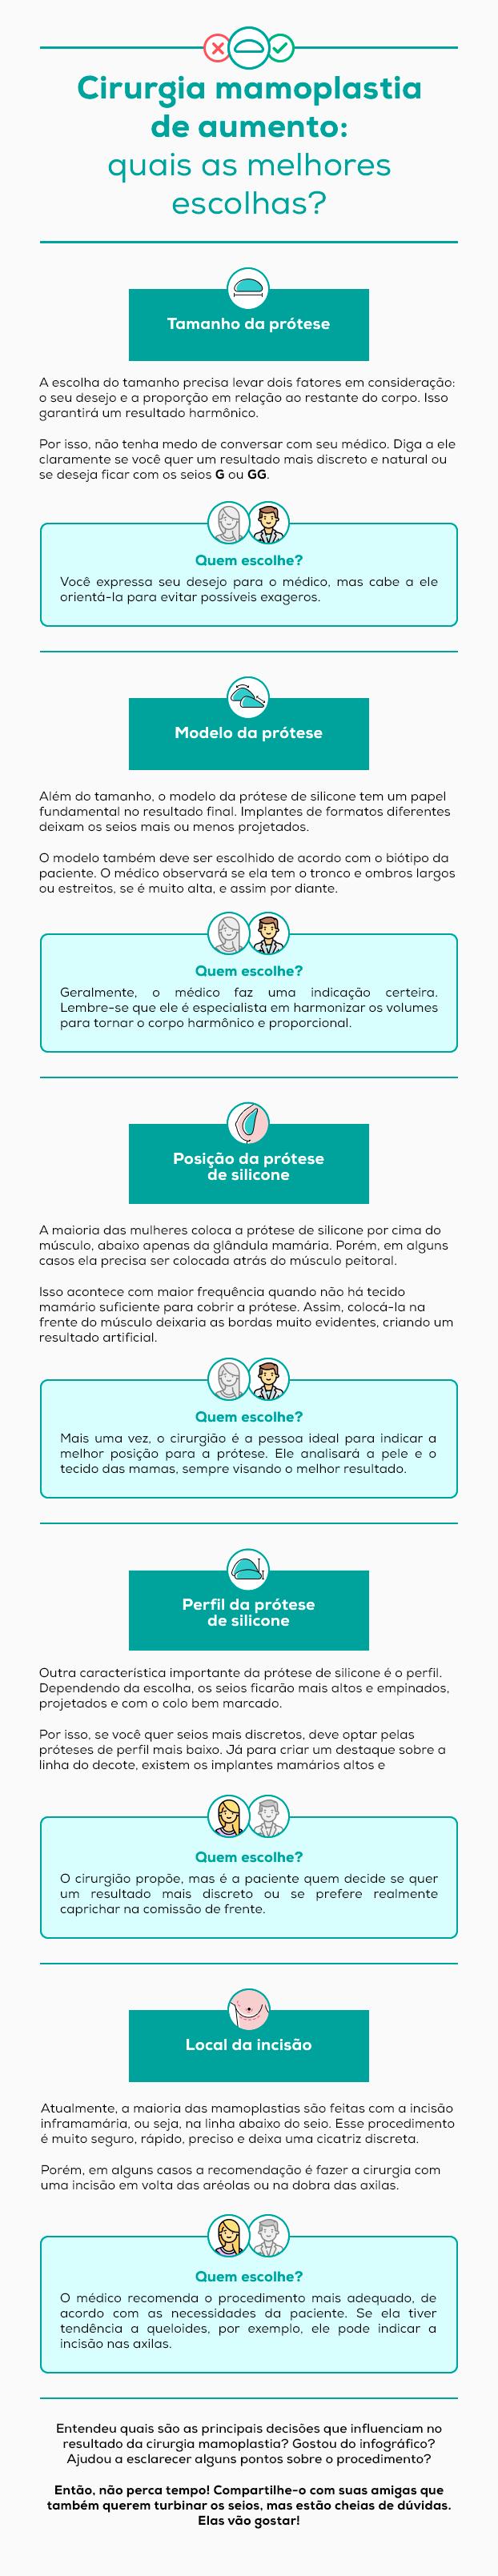 Infográfico - Cirurgia Mamoplastia de Aumento